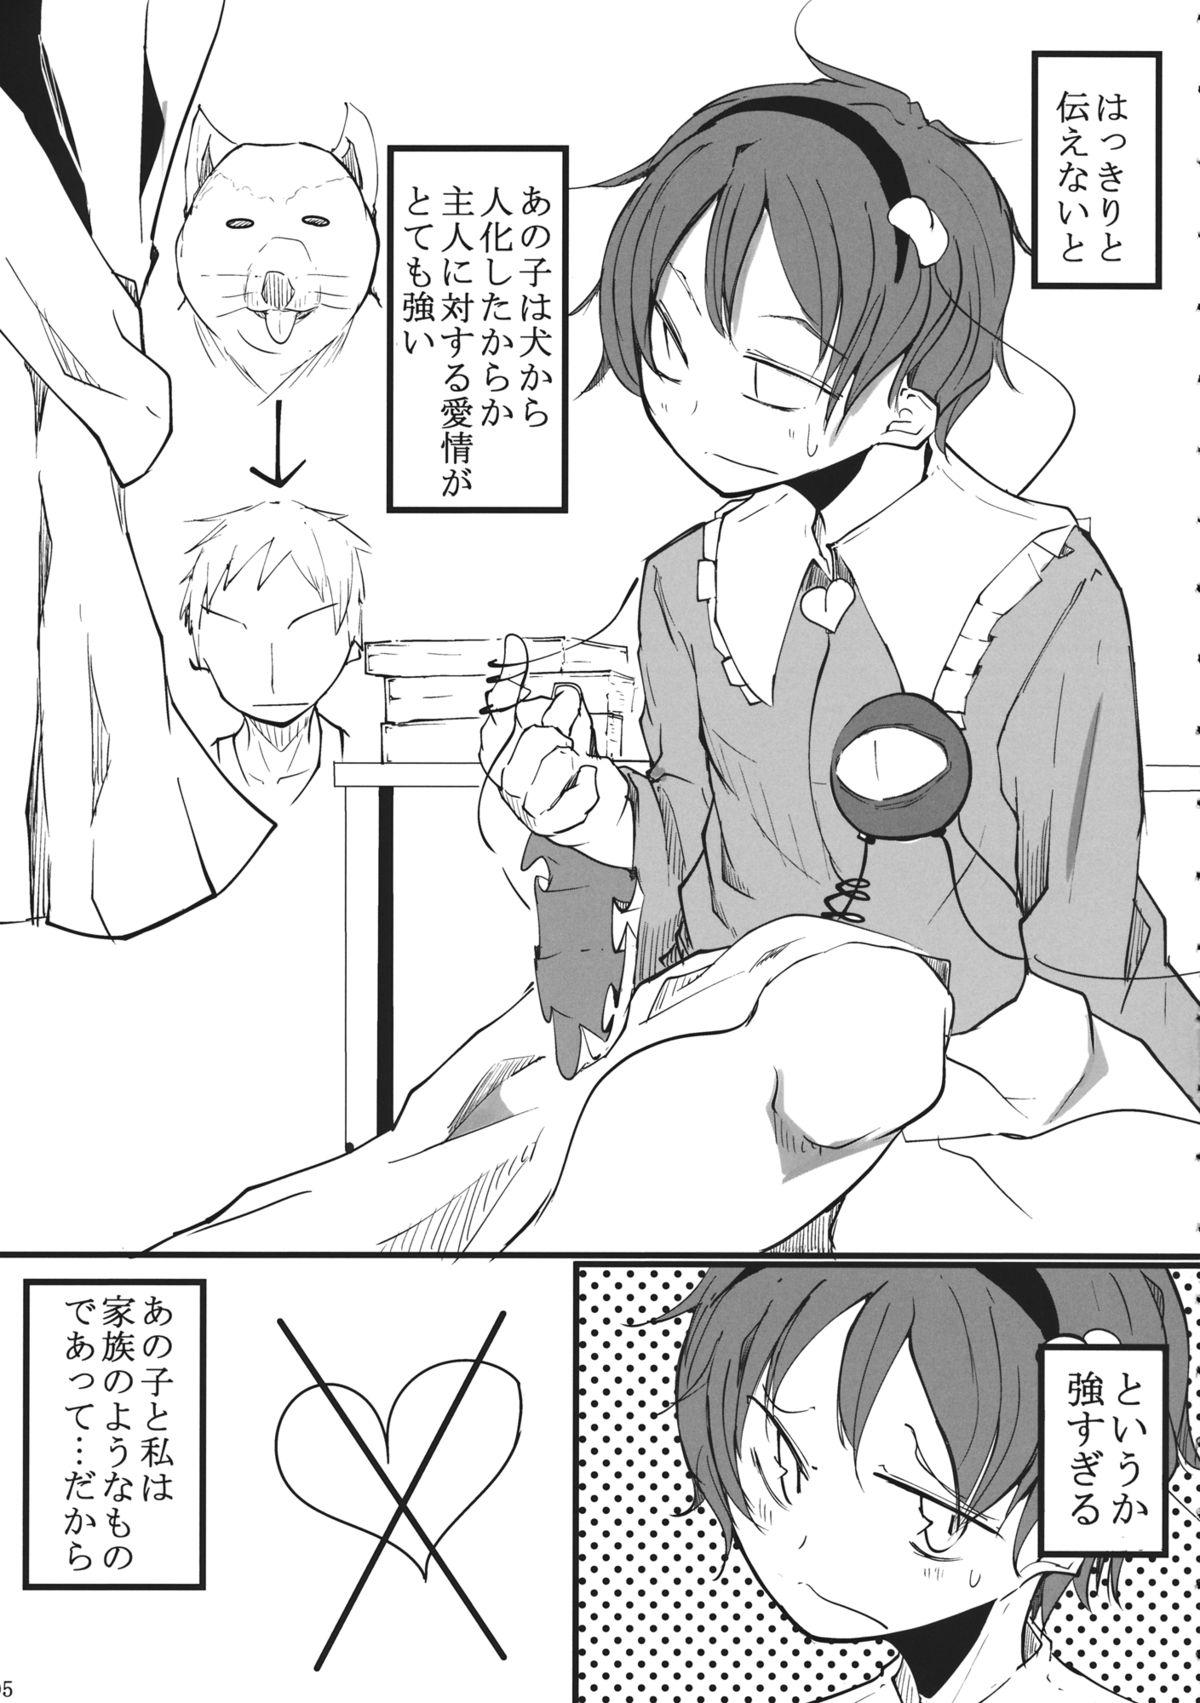 Watashi Sonnano Kaitemasen 3